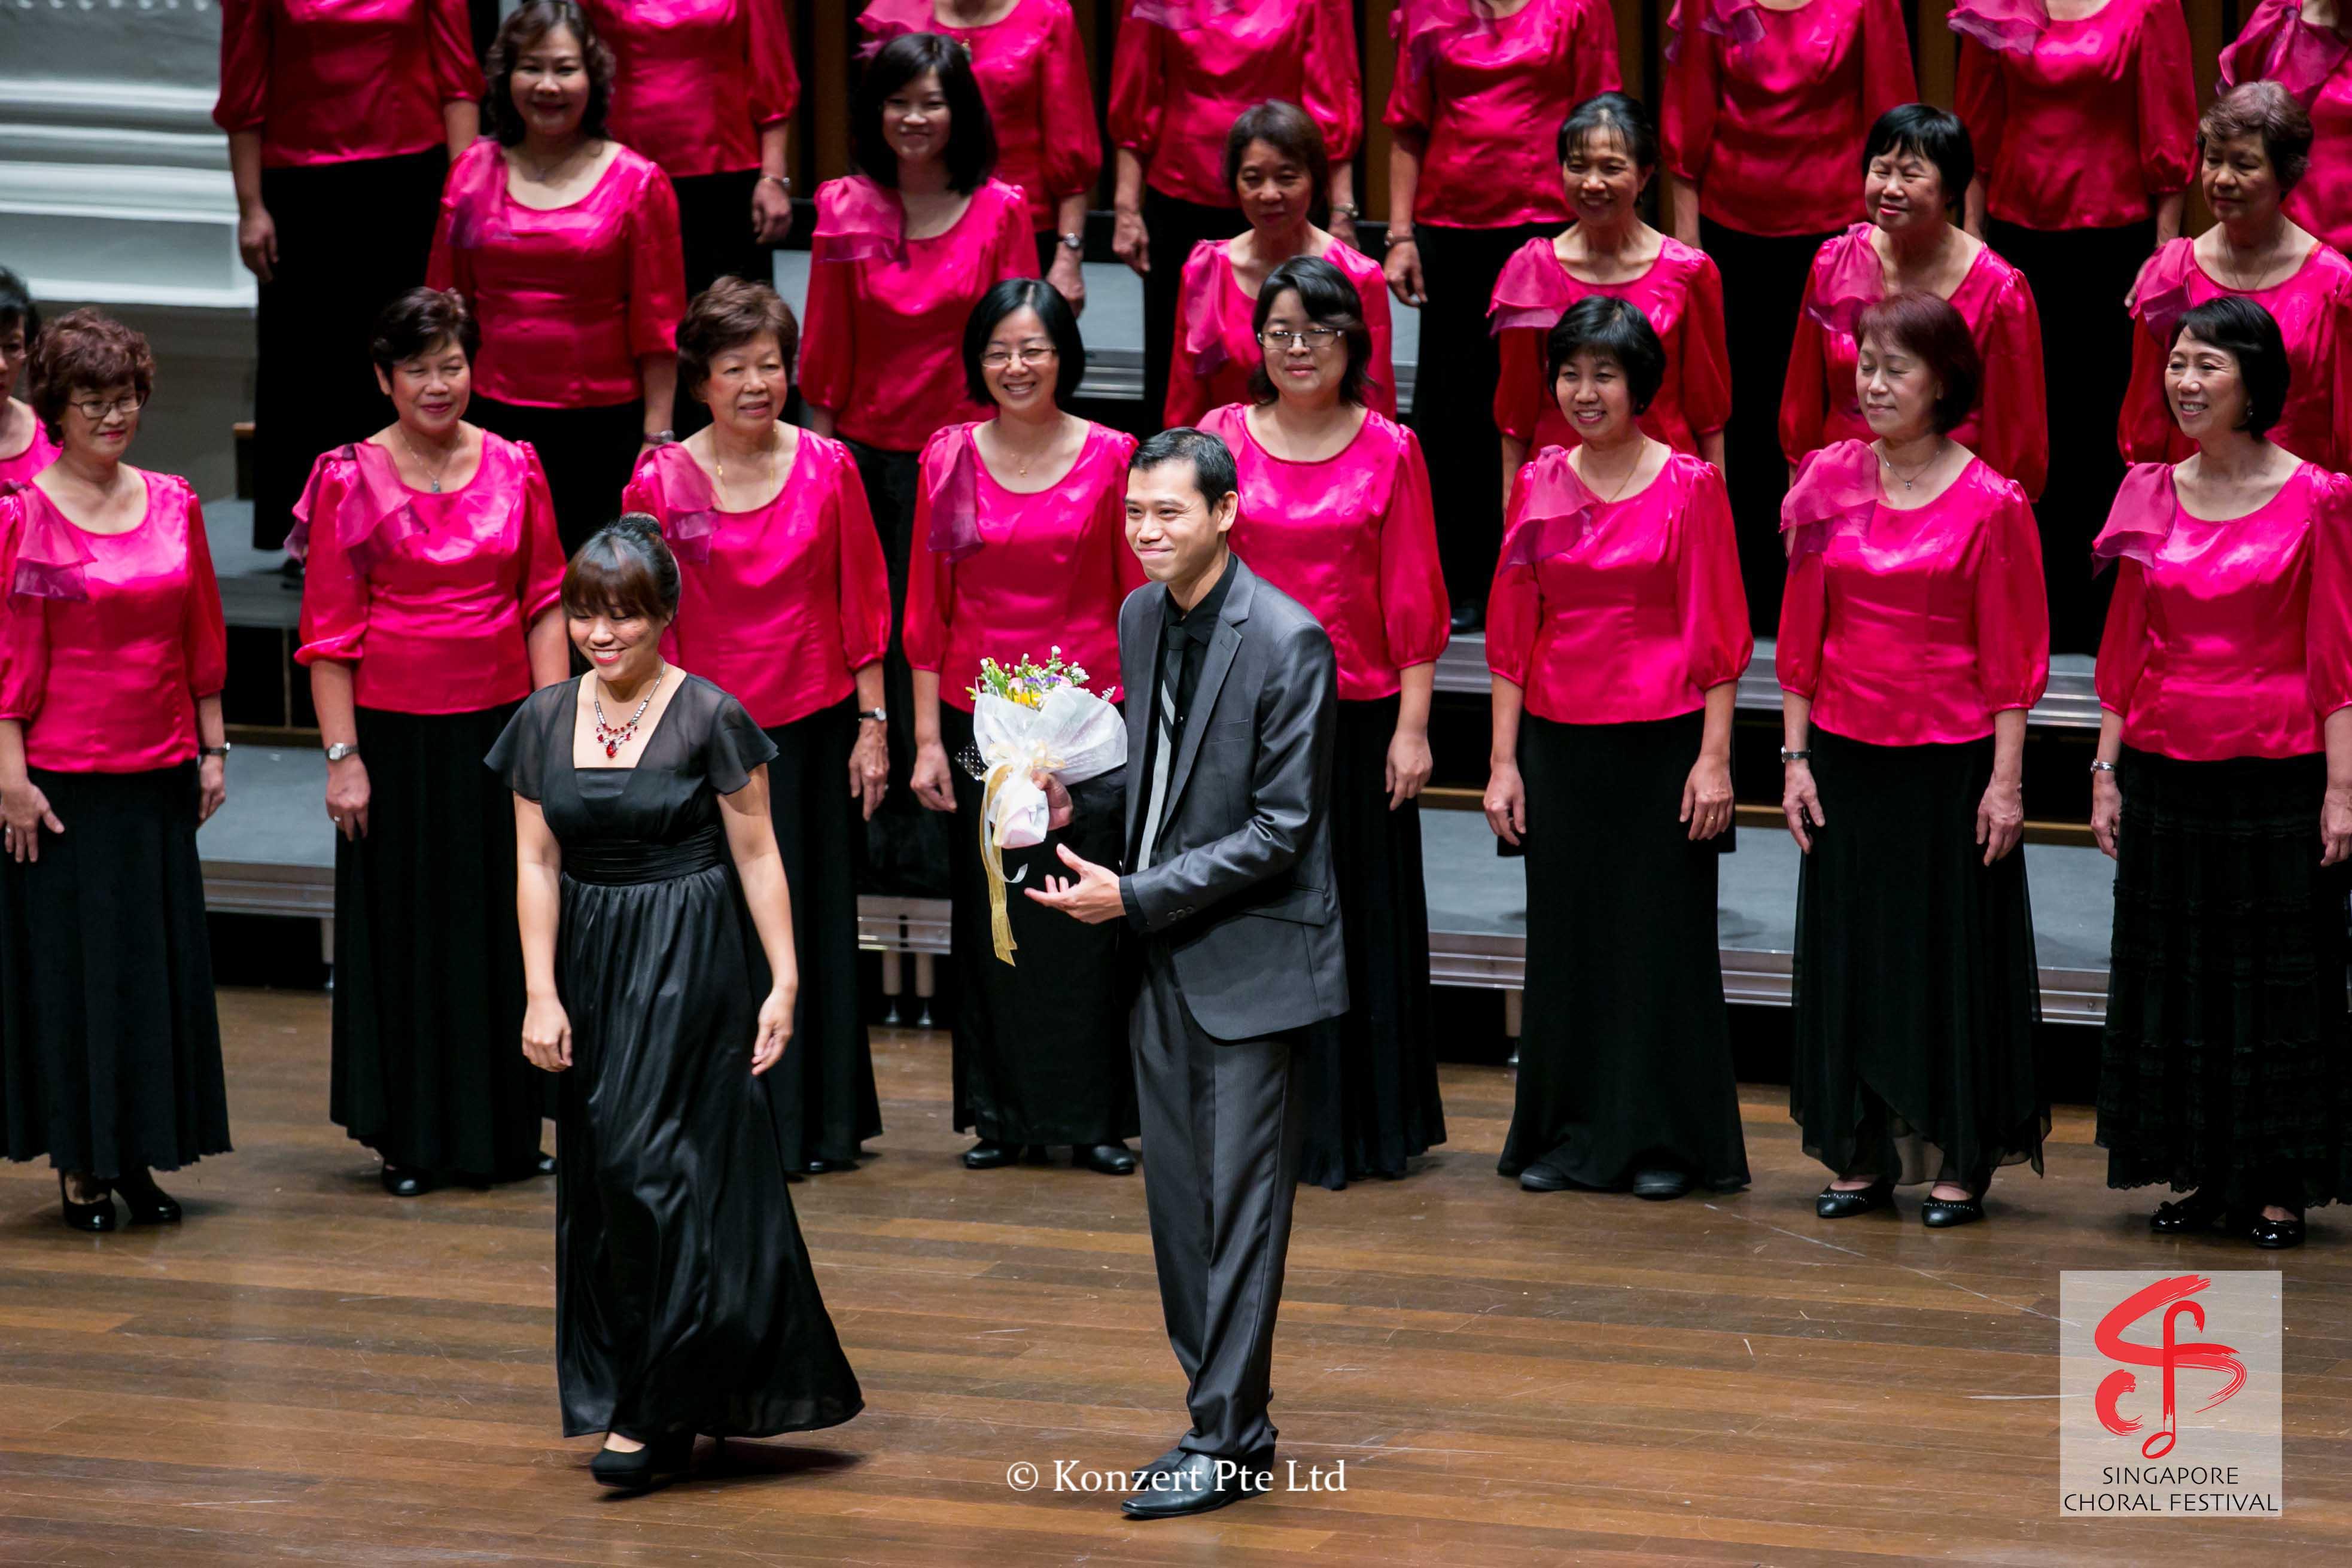 Singapore Choral Festival 7-8-15 (253).jpg